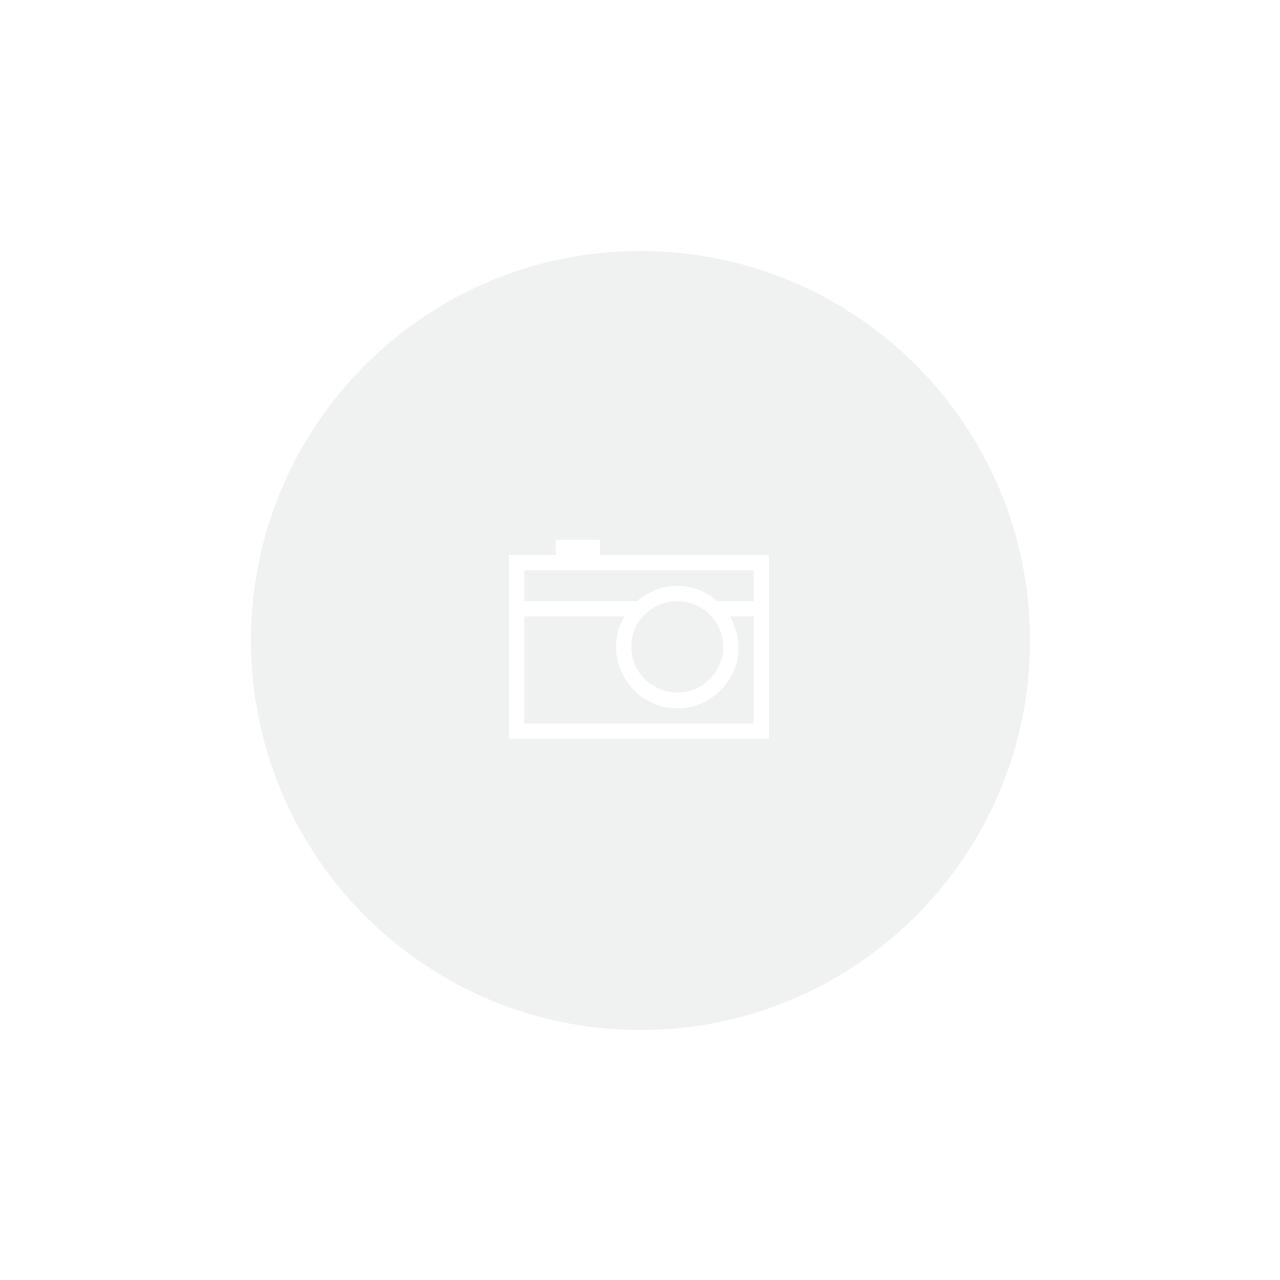 Papel Verniz Foglio 180g - 02